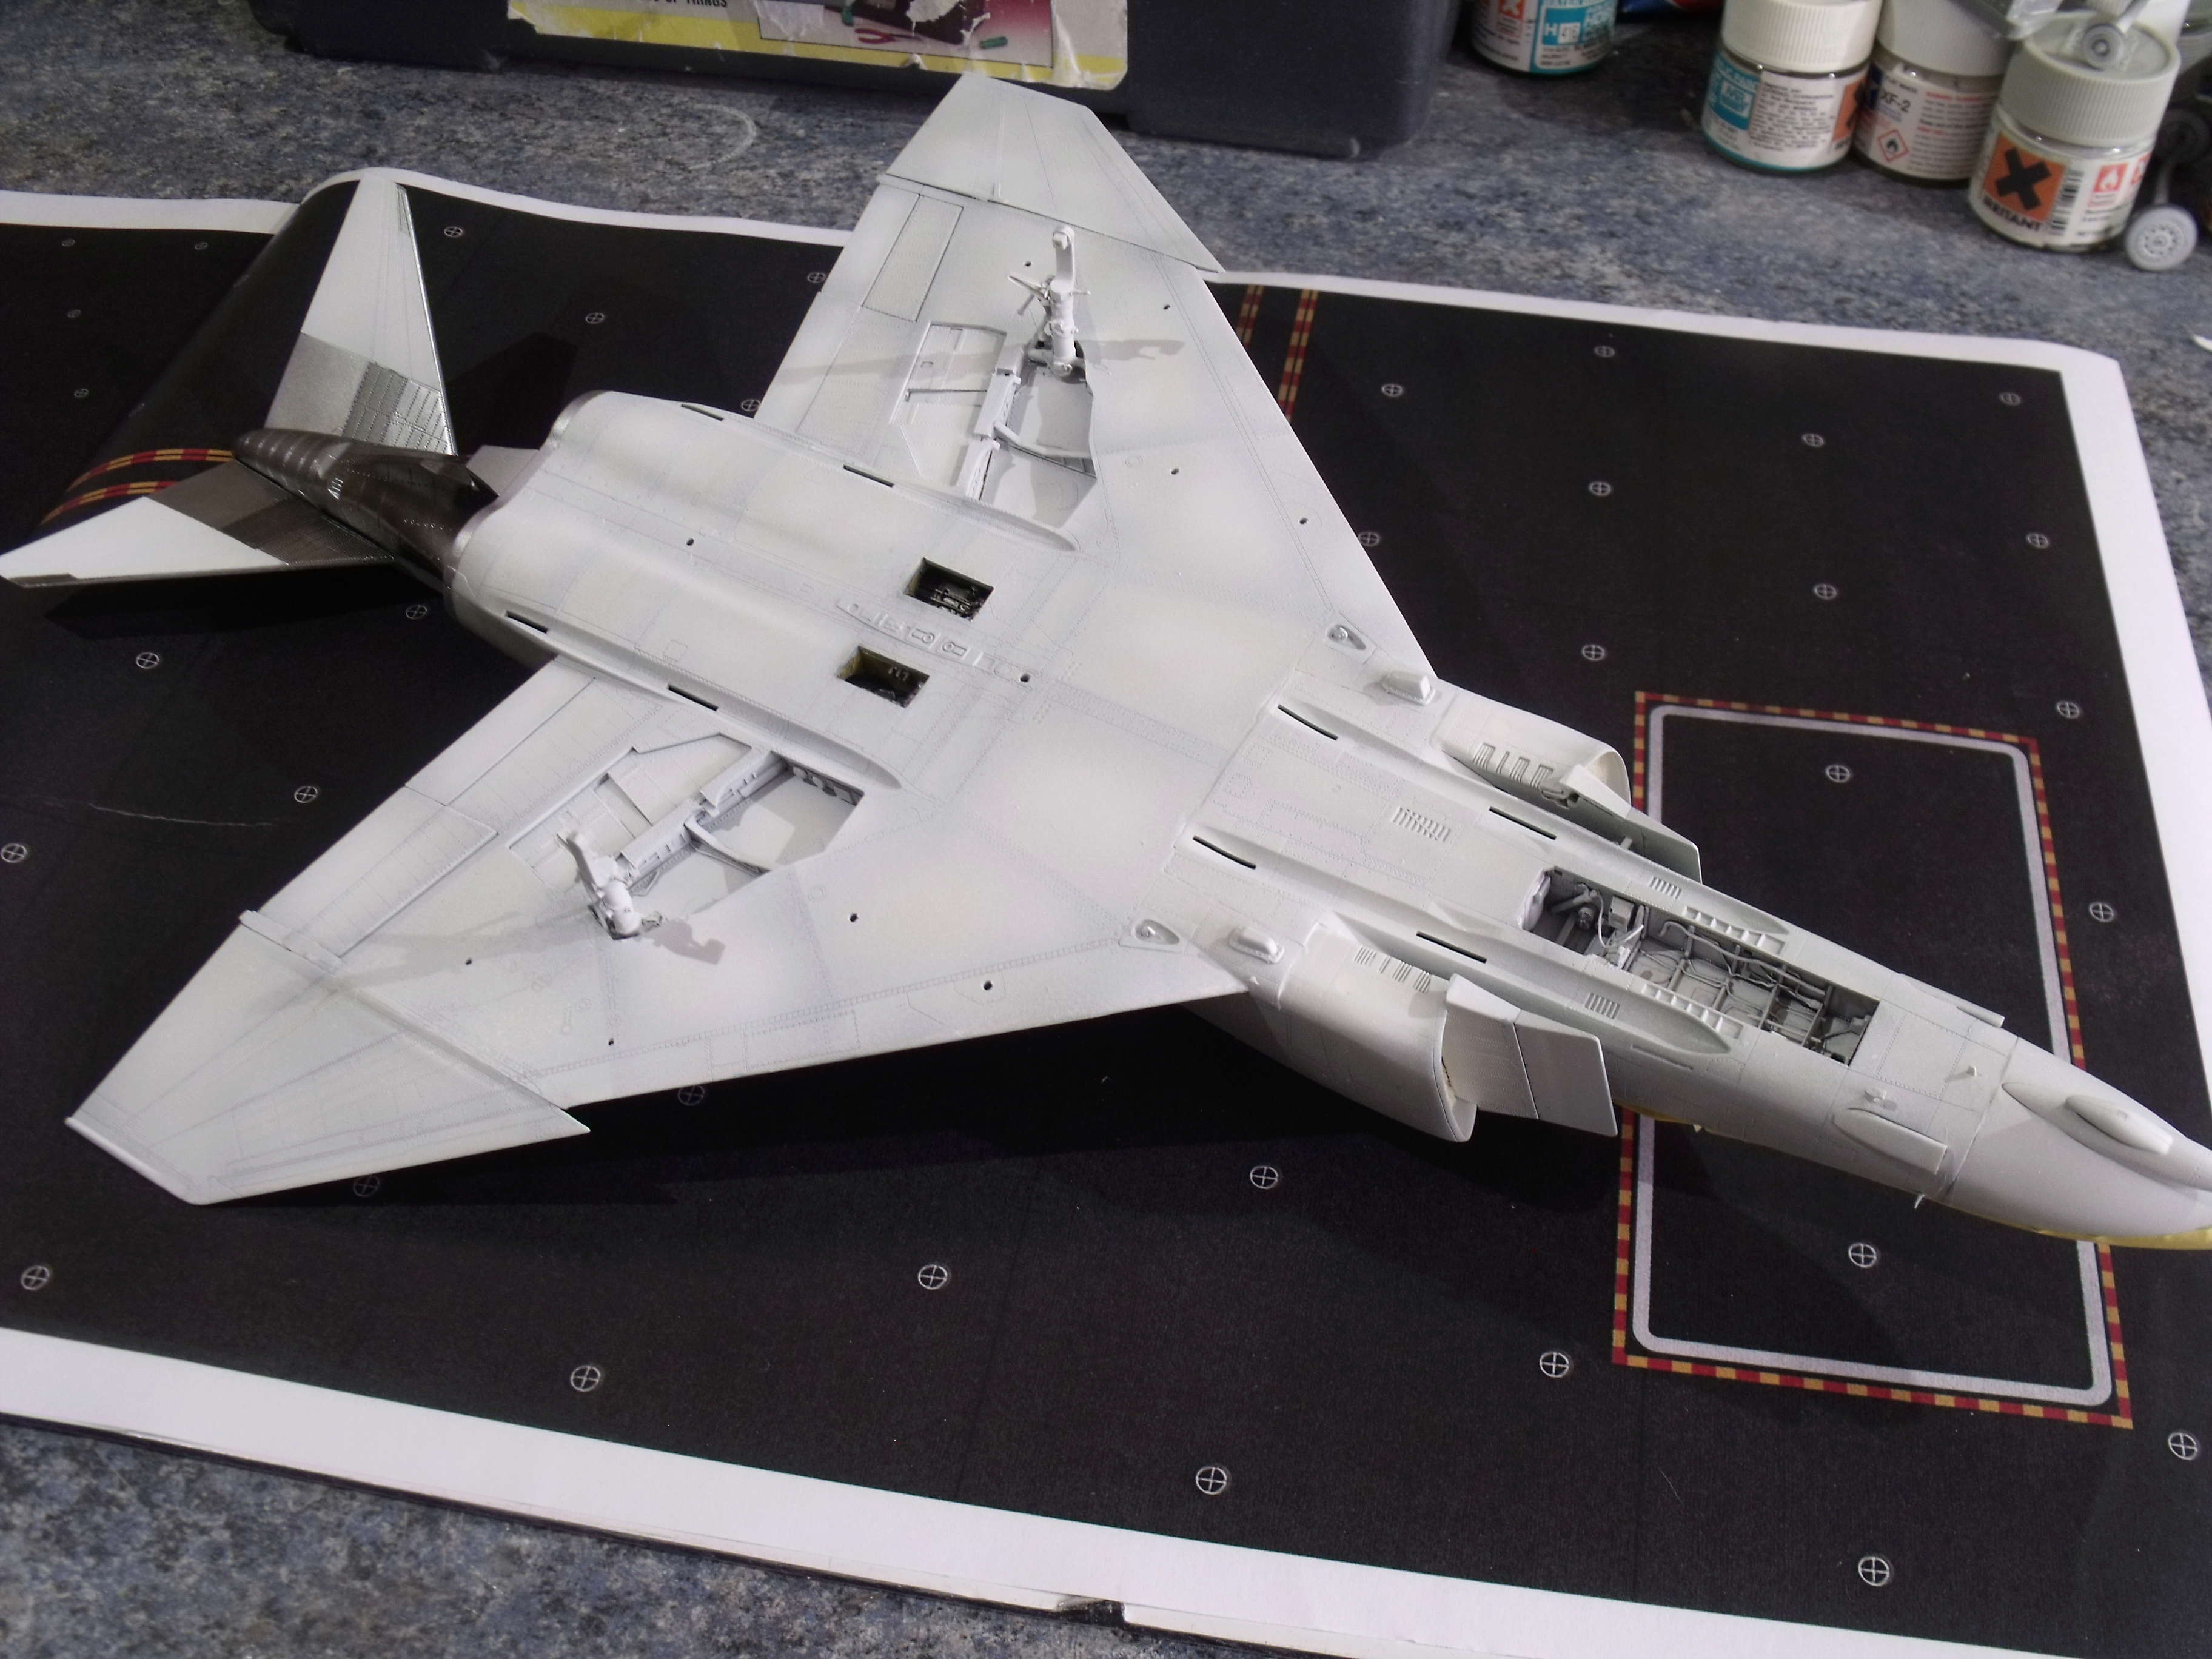 F-4 B Phantom 1/48° - VF-51 - 1972 - Début de patine. - Page 4 Dscf7136